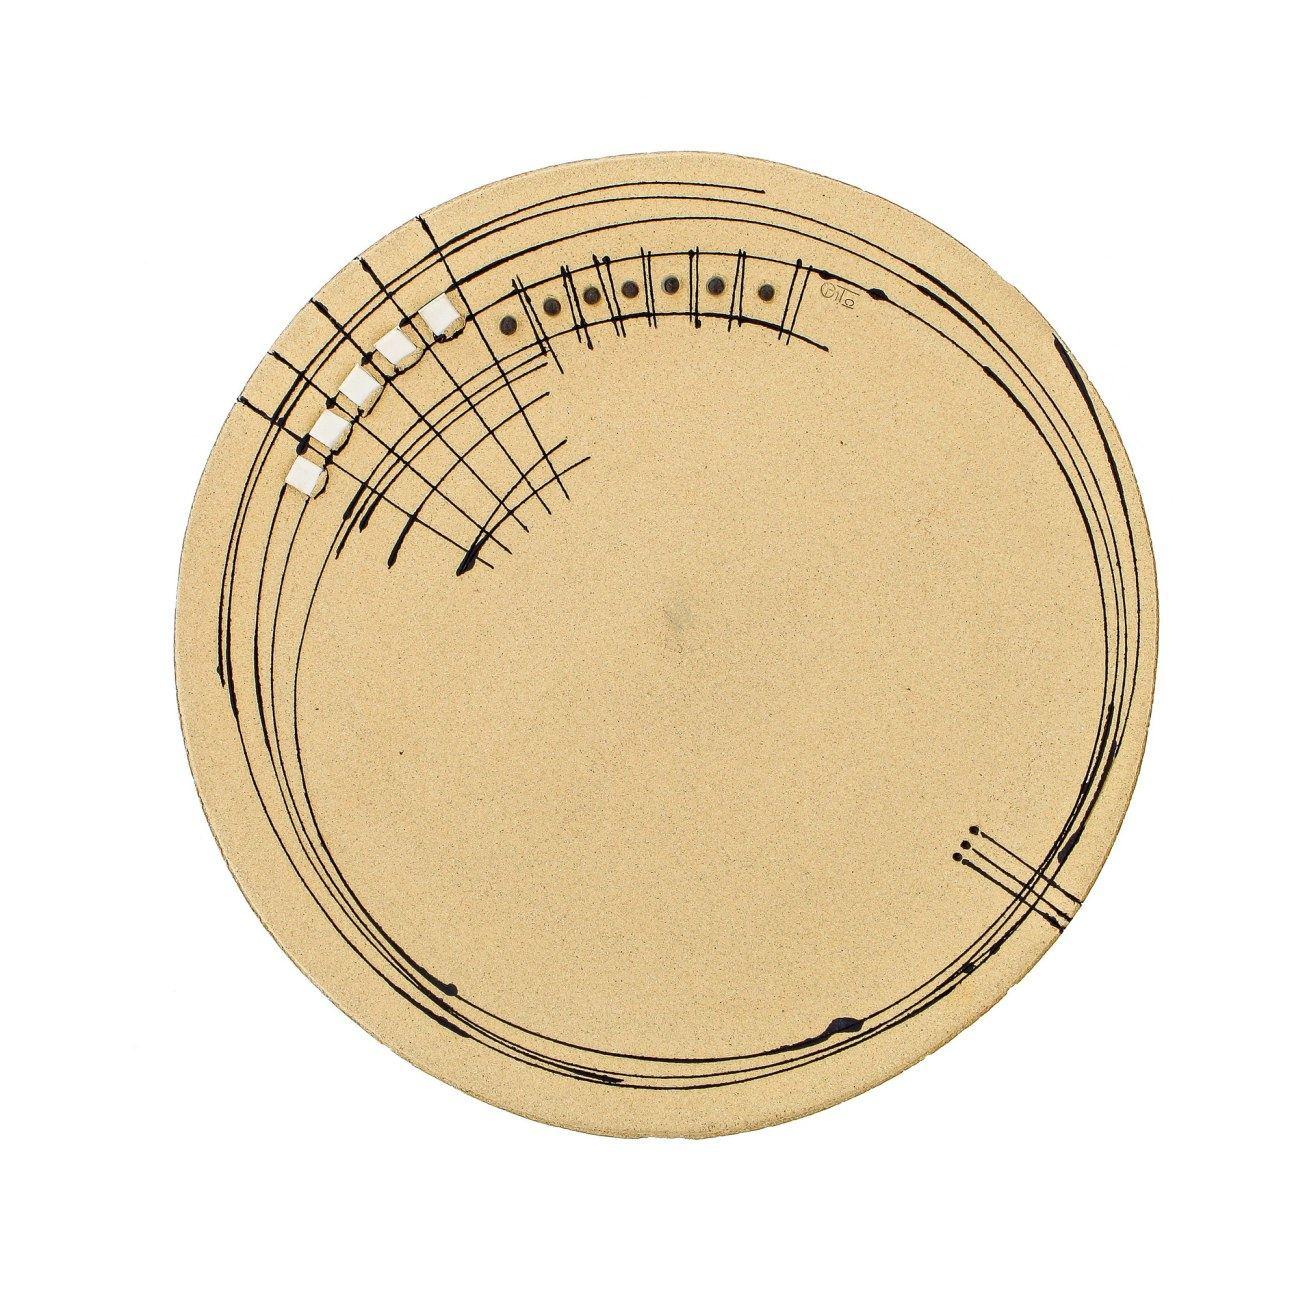 Large Decorative Ceramic Platter Handmade Modern Table Art Decor Beige 17  (43cm)  sc 1 st  Elite Crafters & Large Decorative Ceramic Platter Handmade Modern Table Art Decor ...